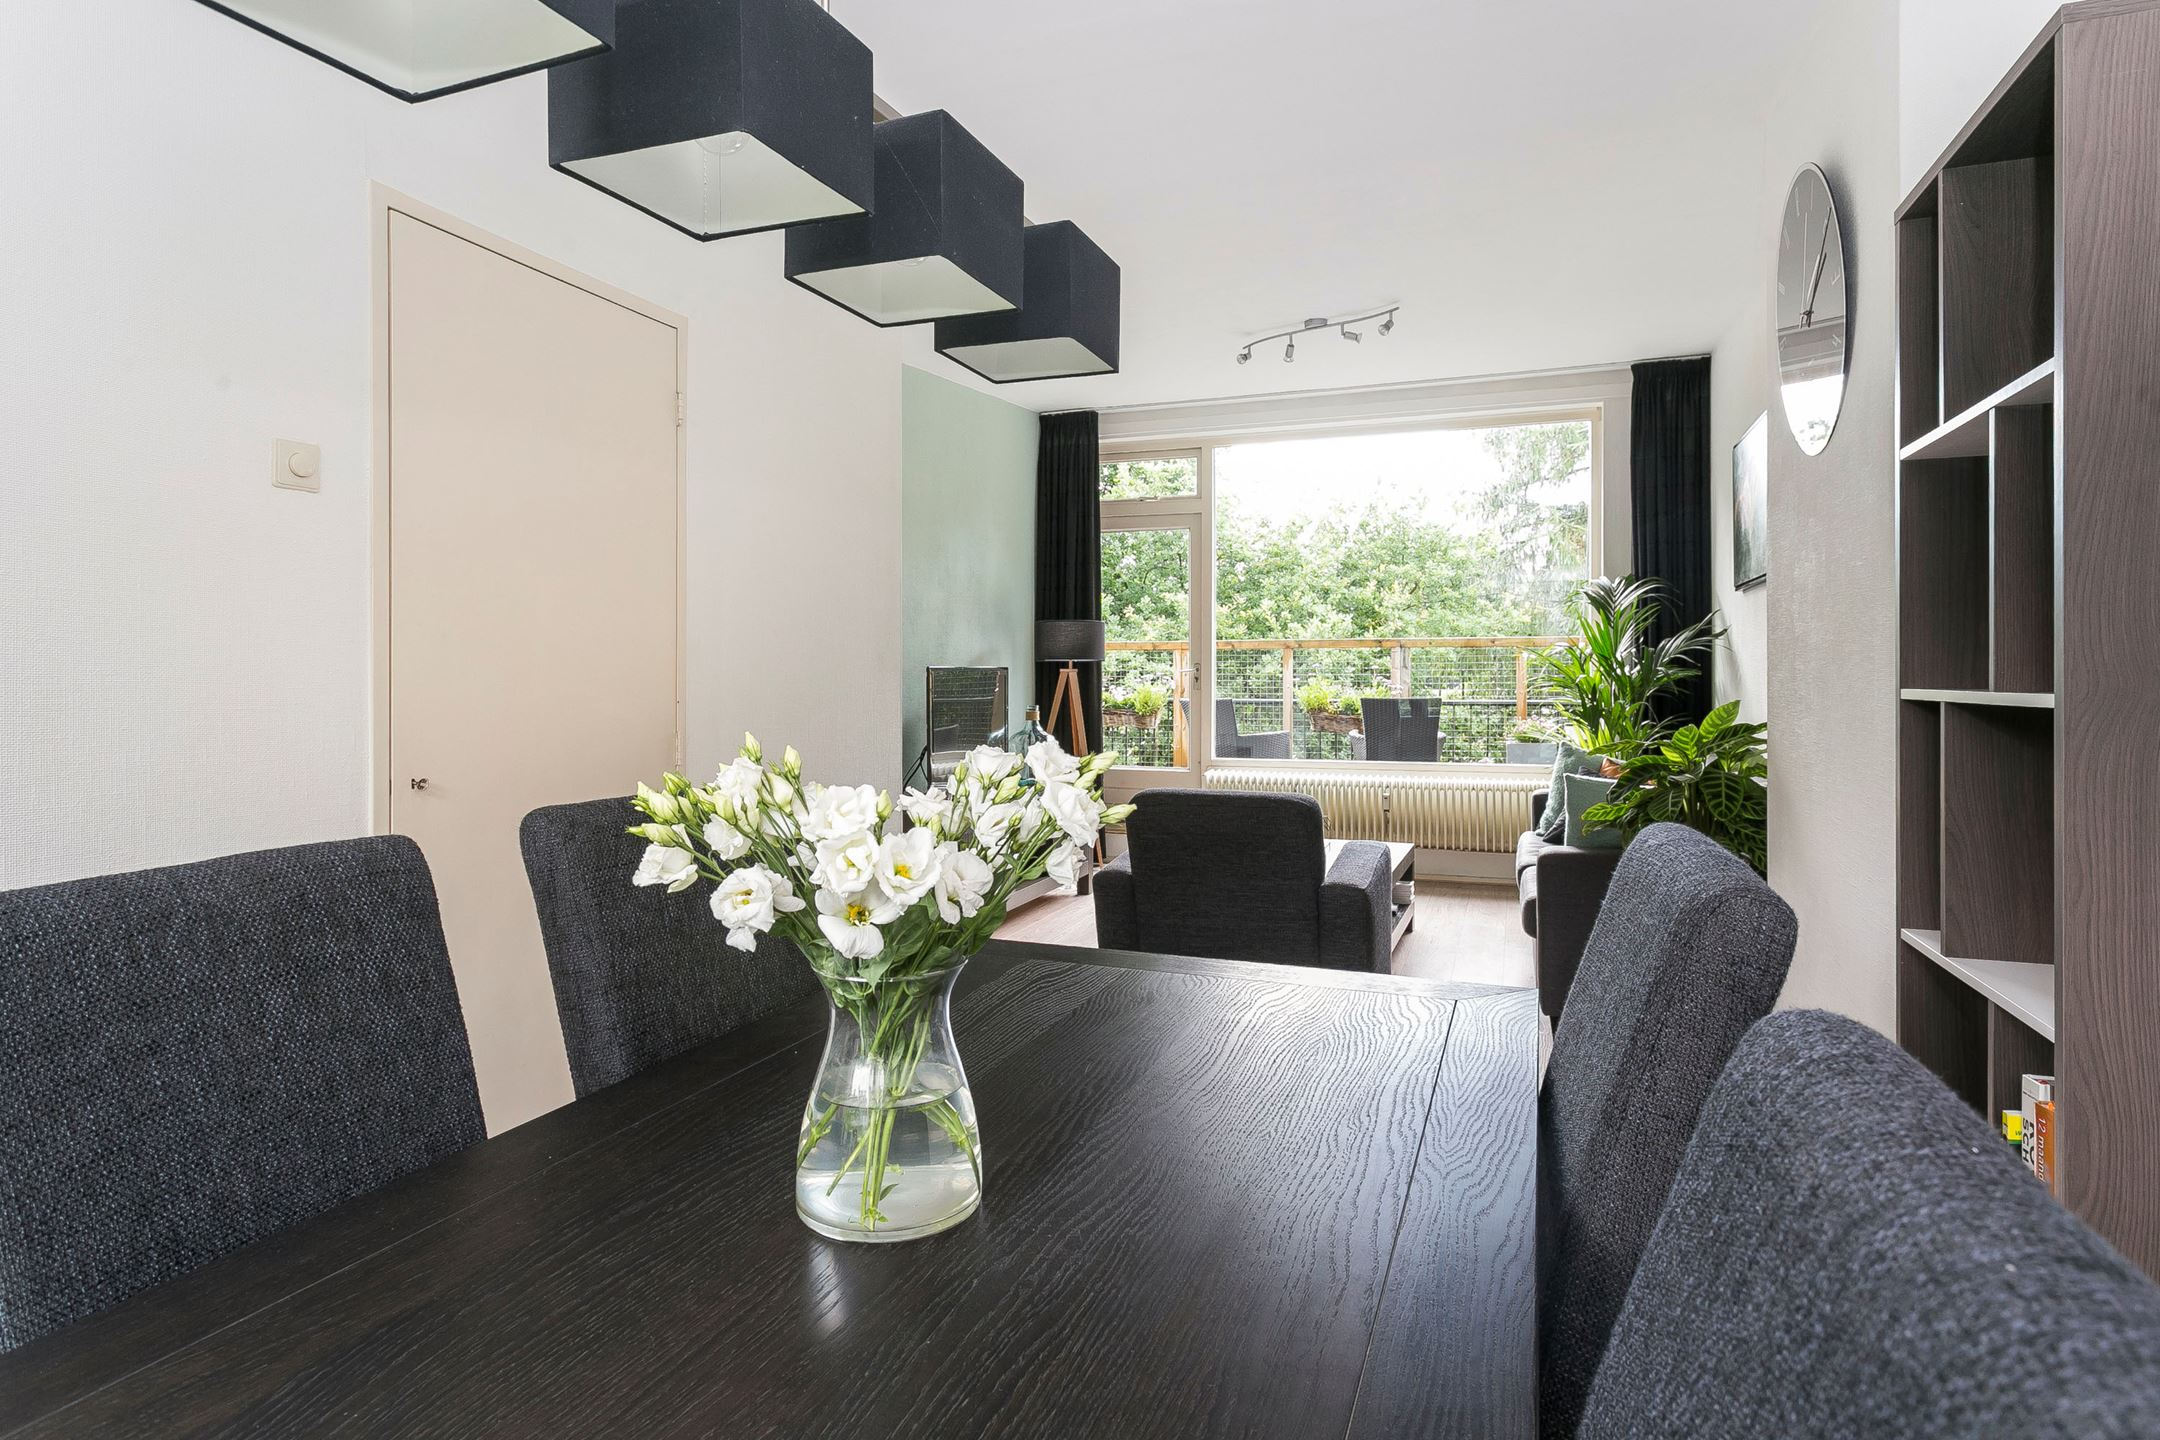 Appartement te koop: Debussystraat 3 -4 6815 HK Arnhem [funda]